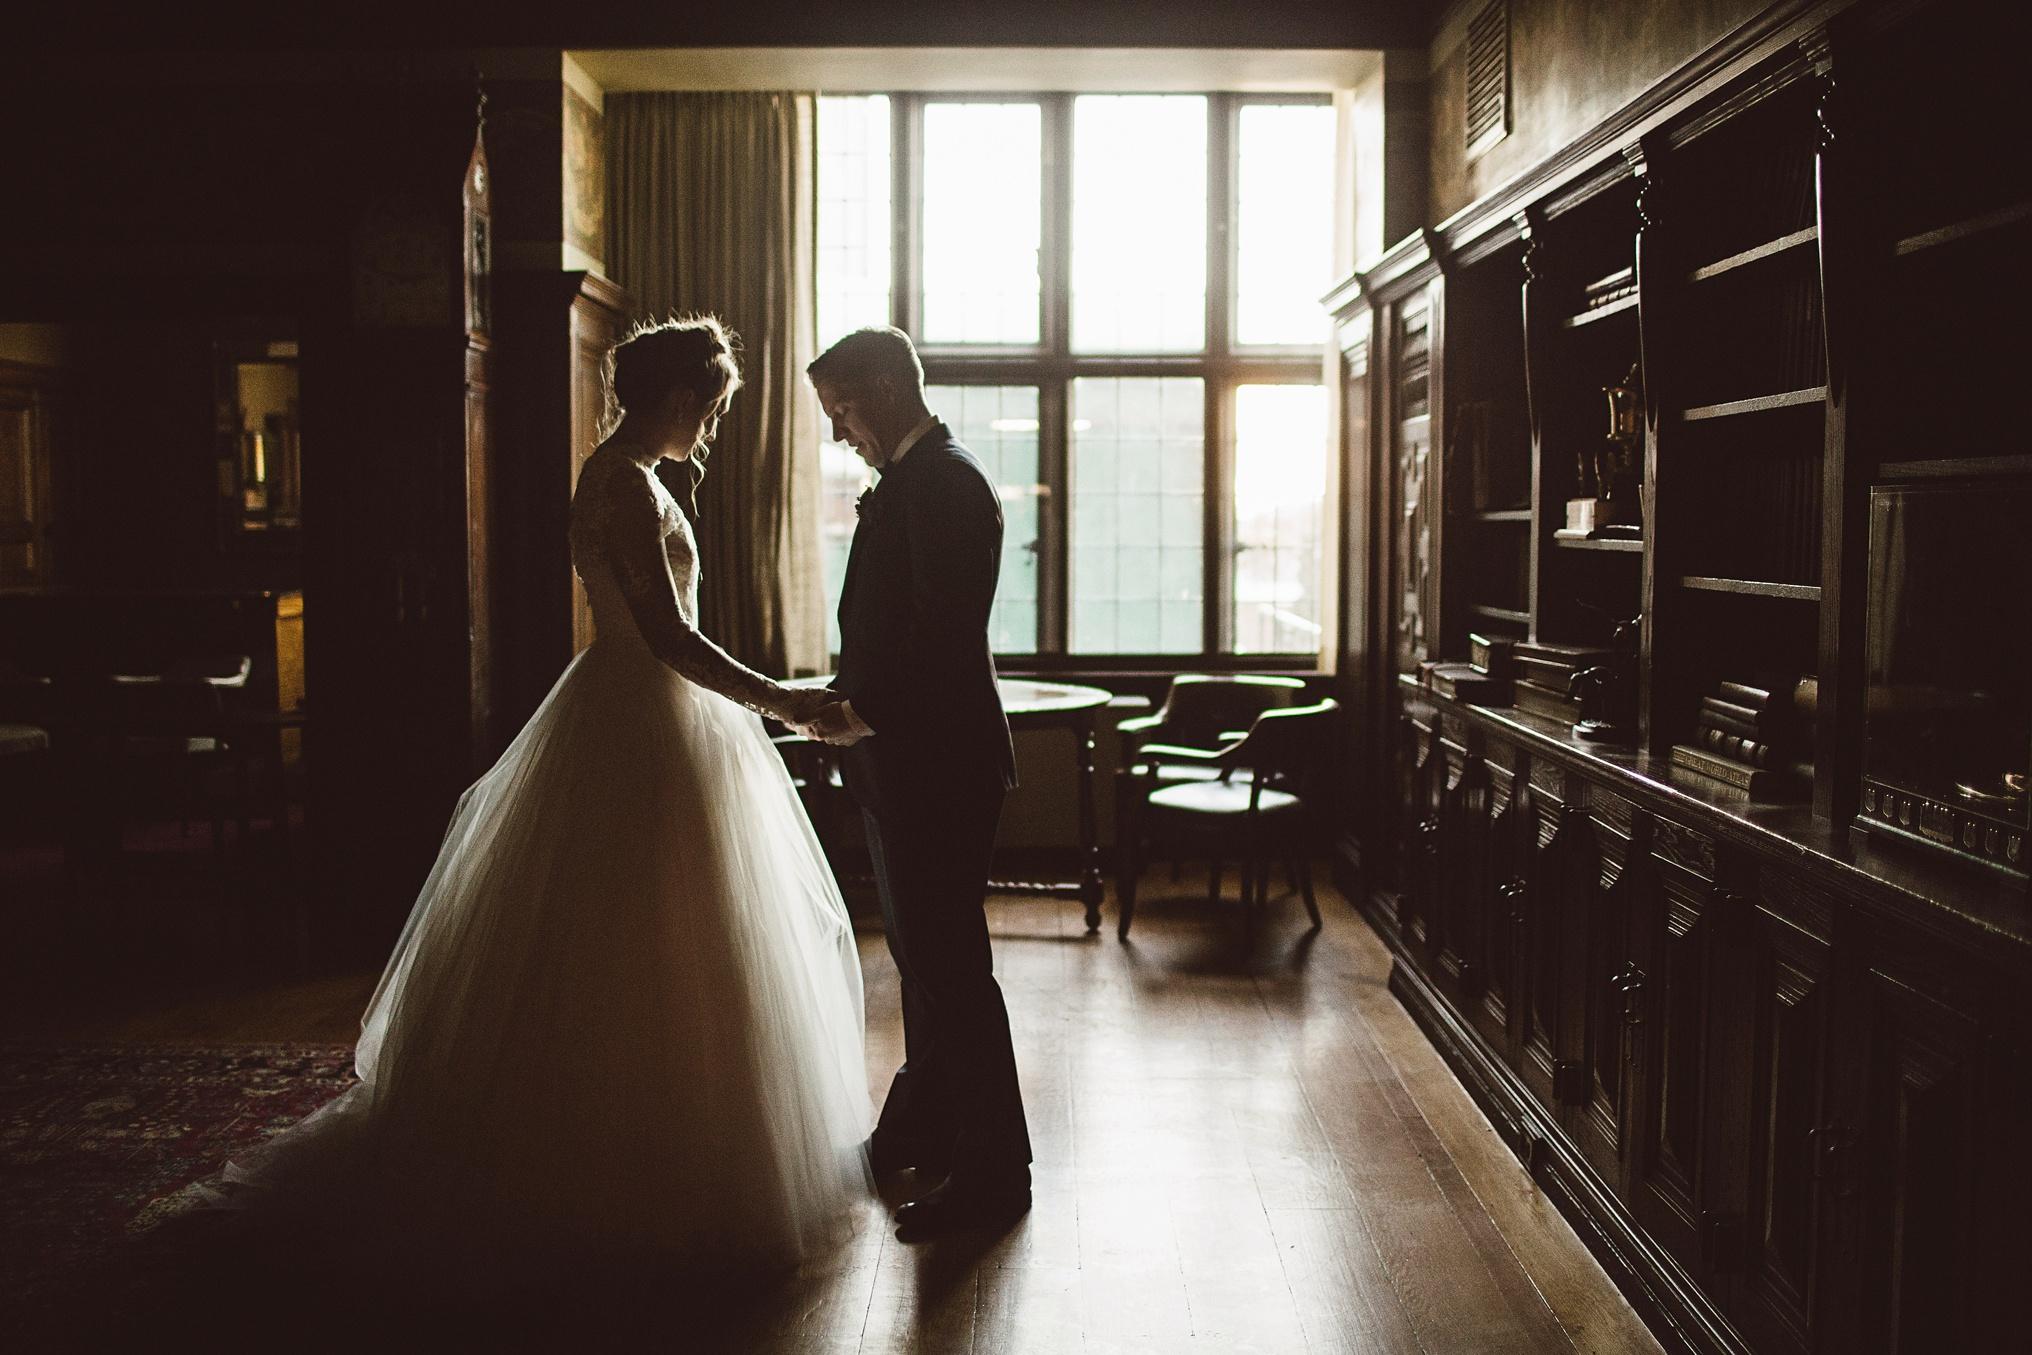 best_wedding_photography_2017_by_lucas_botz_photography_193.jpg